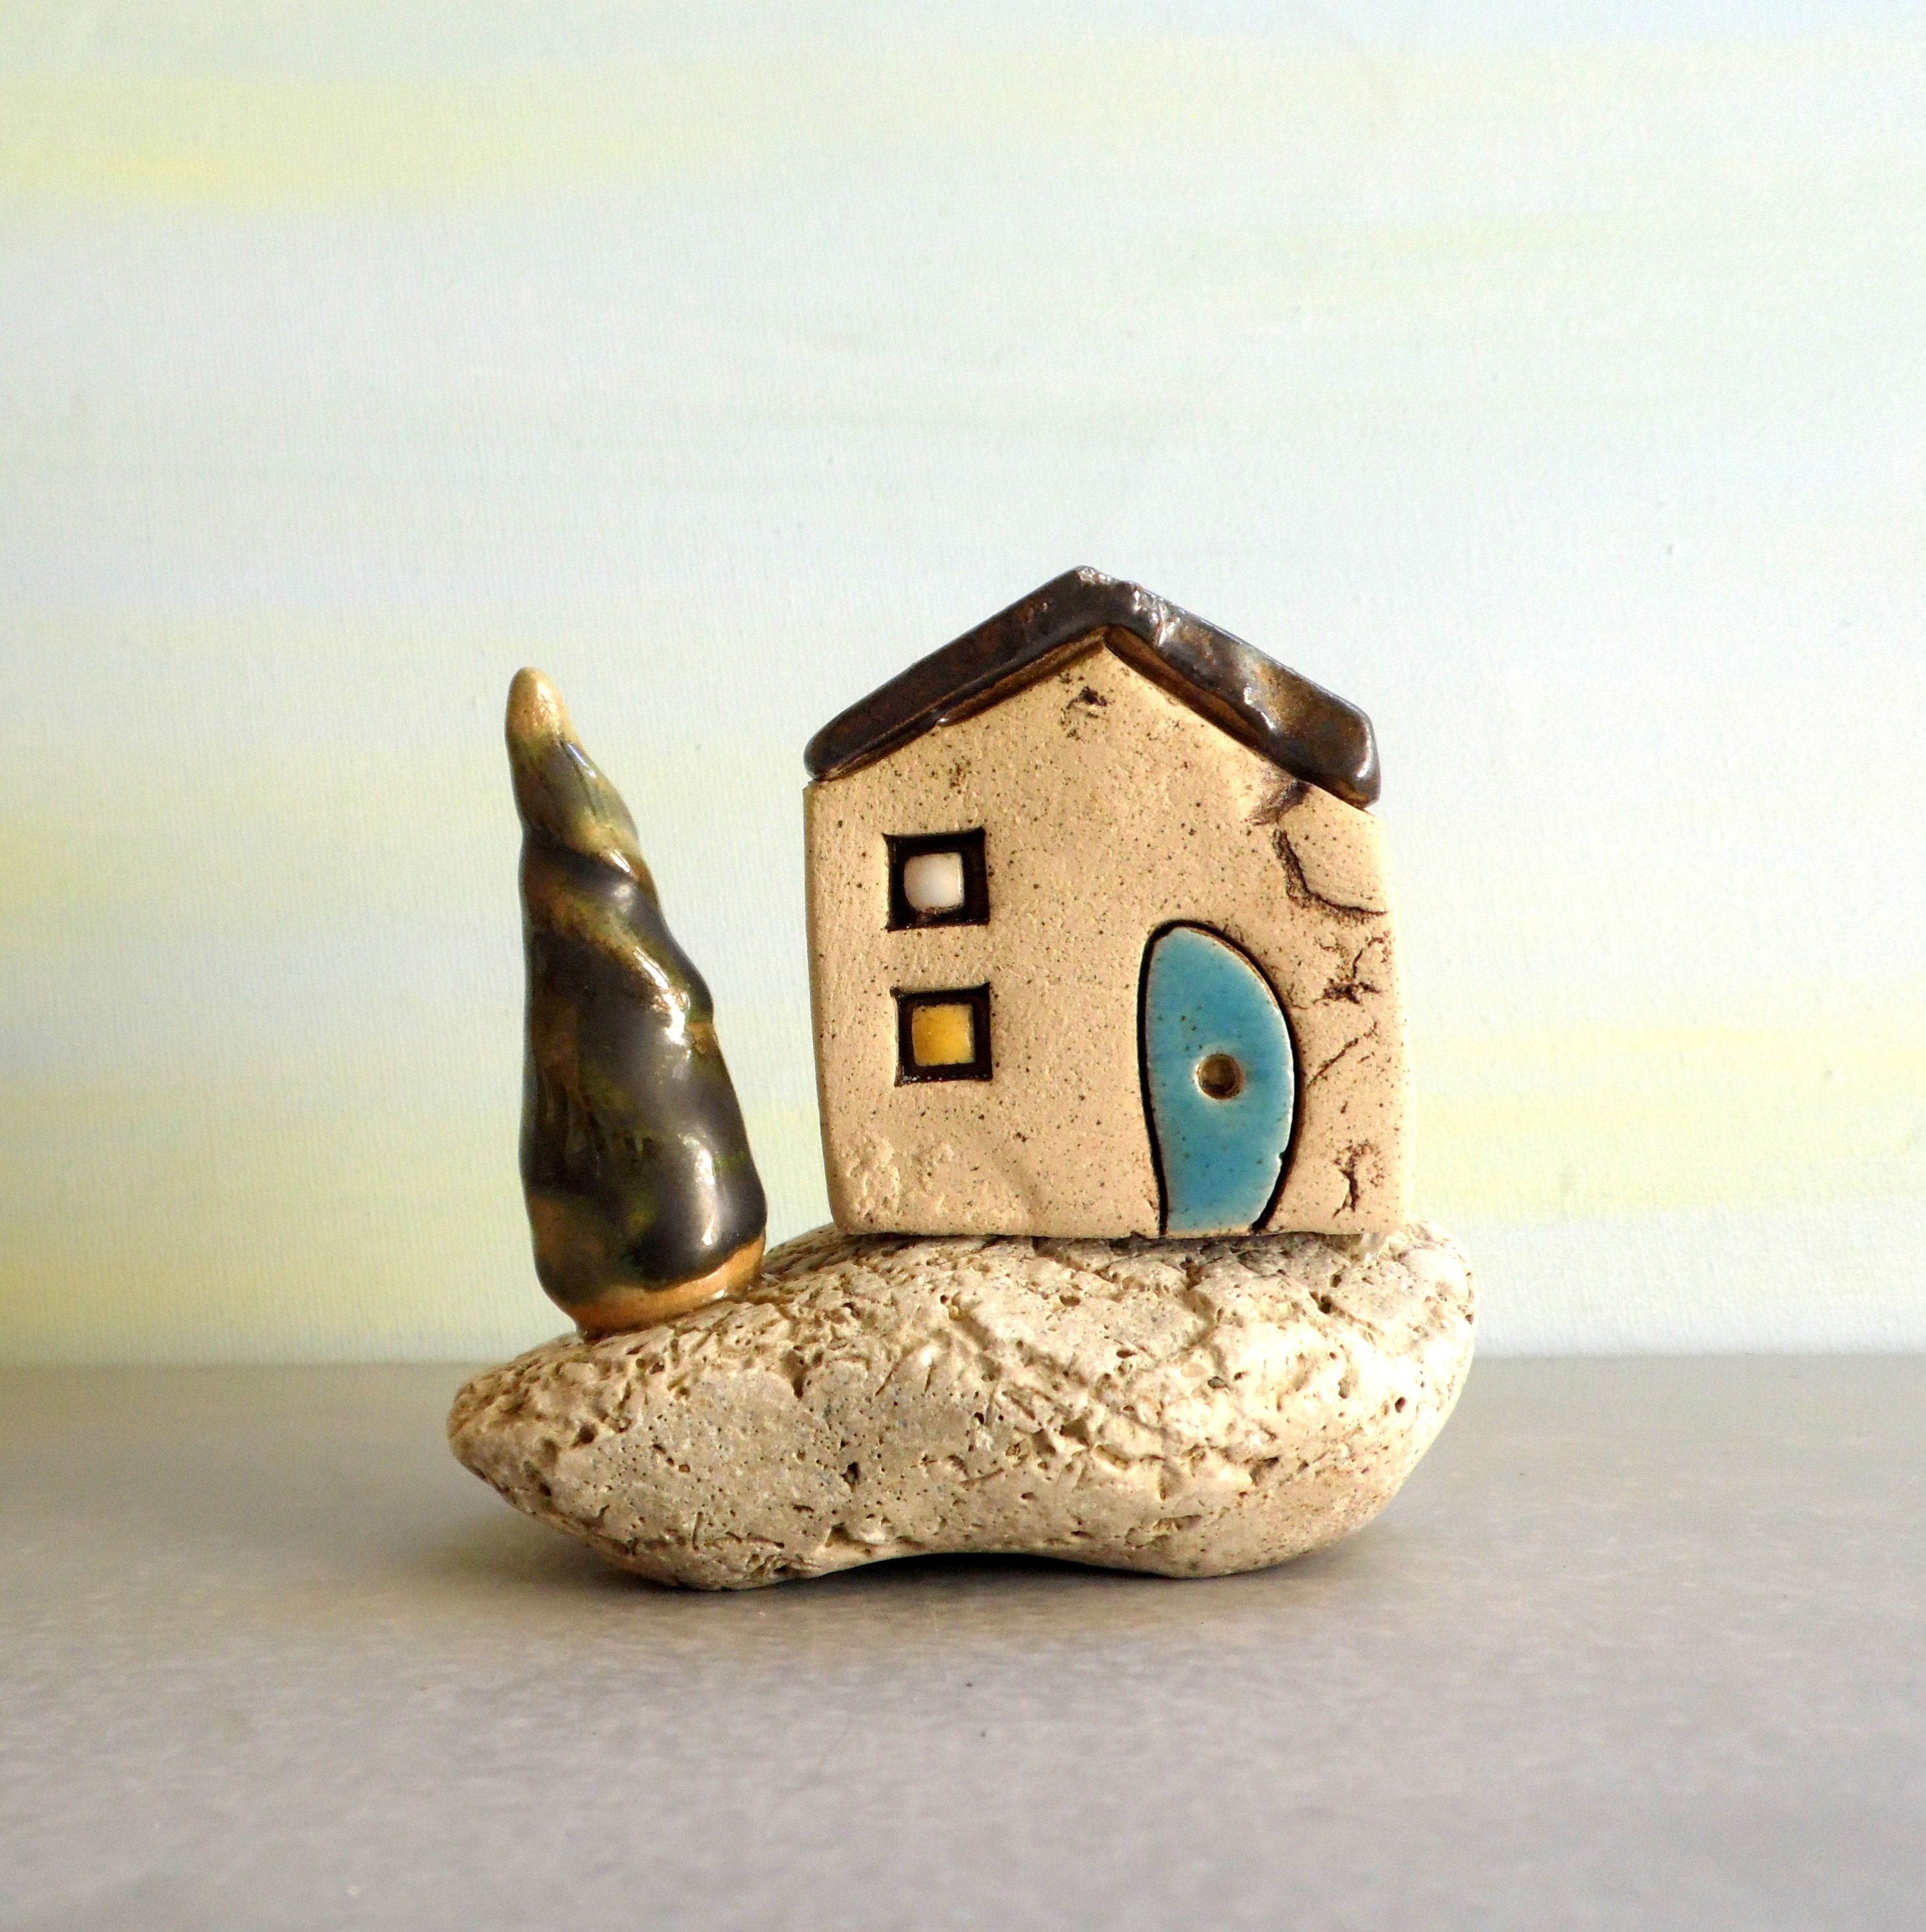 Ceramic sculpture, Miniature house, Israeli art, Stocking stuffer ...